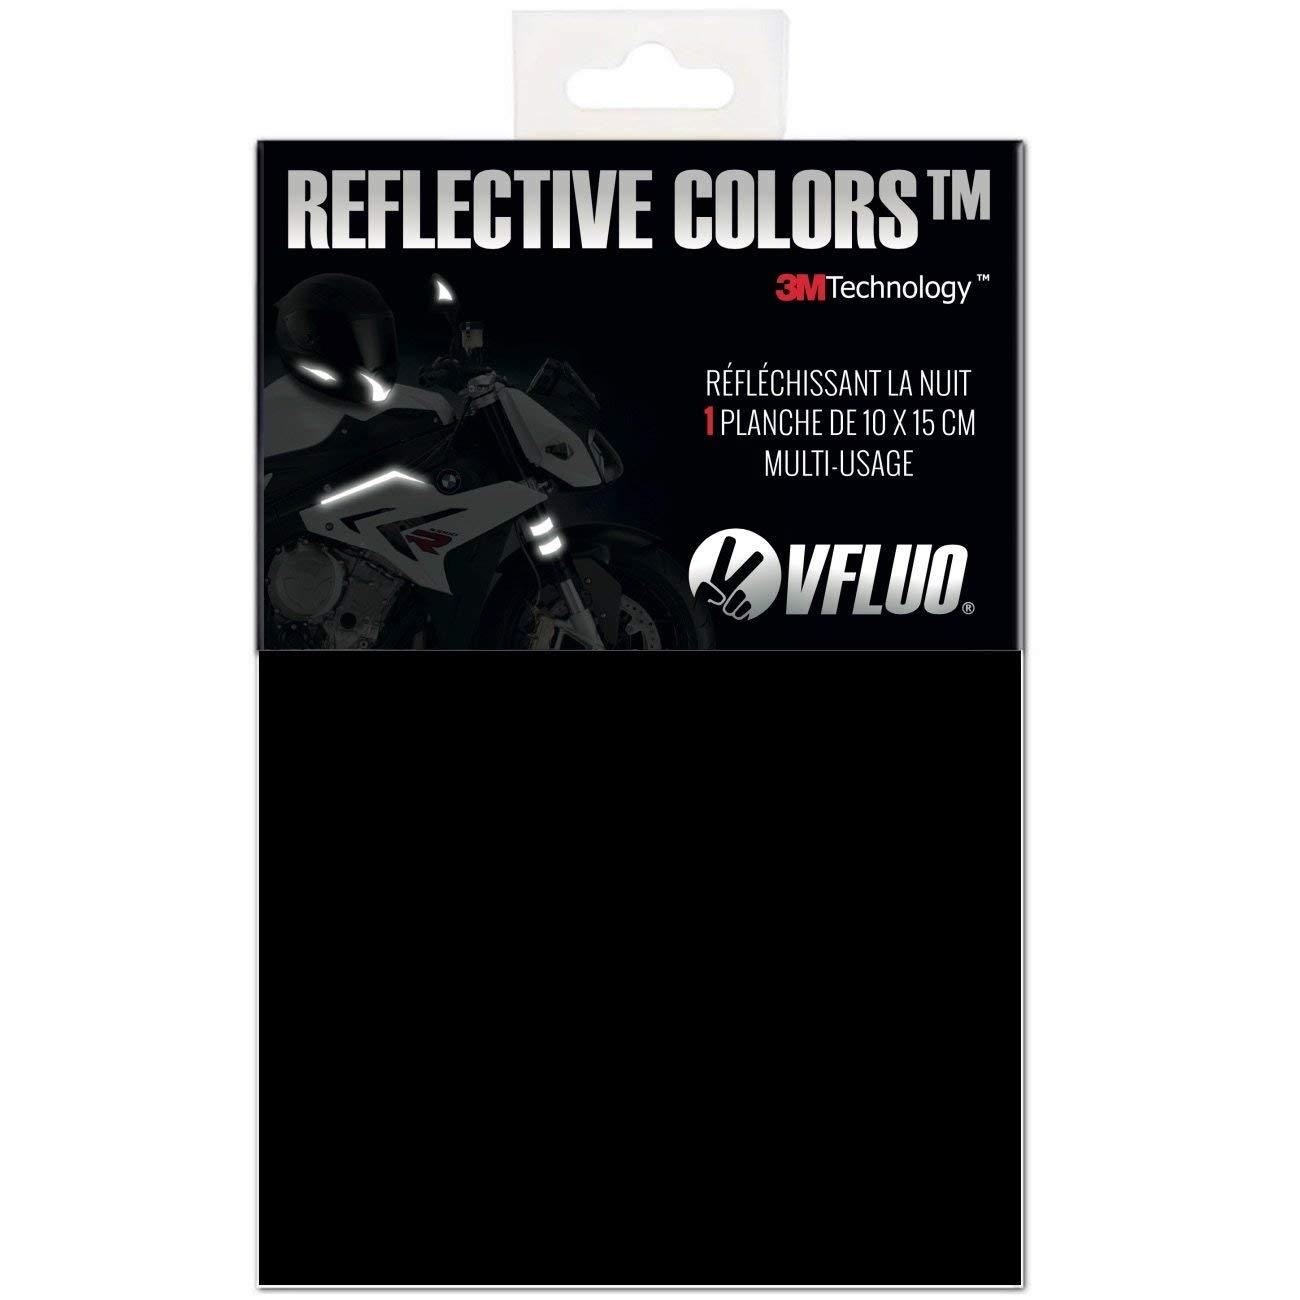 VFLUO 3M REFLECTIVE COLORS/™ Universal adhesive DIY kit for Helmet//Motorbike//Scooter//Bike 10 x 15 cm sheet Black 3M Technology/™